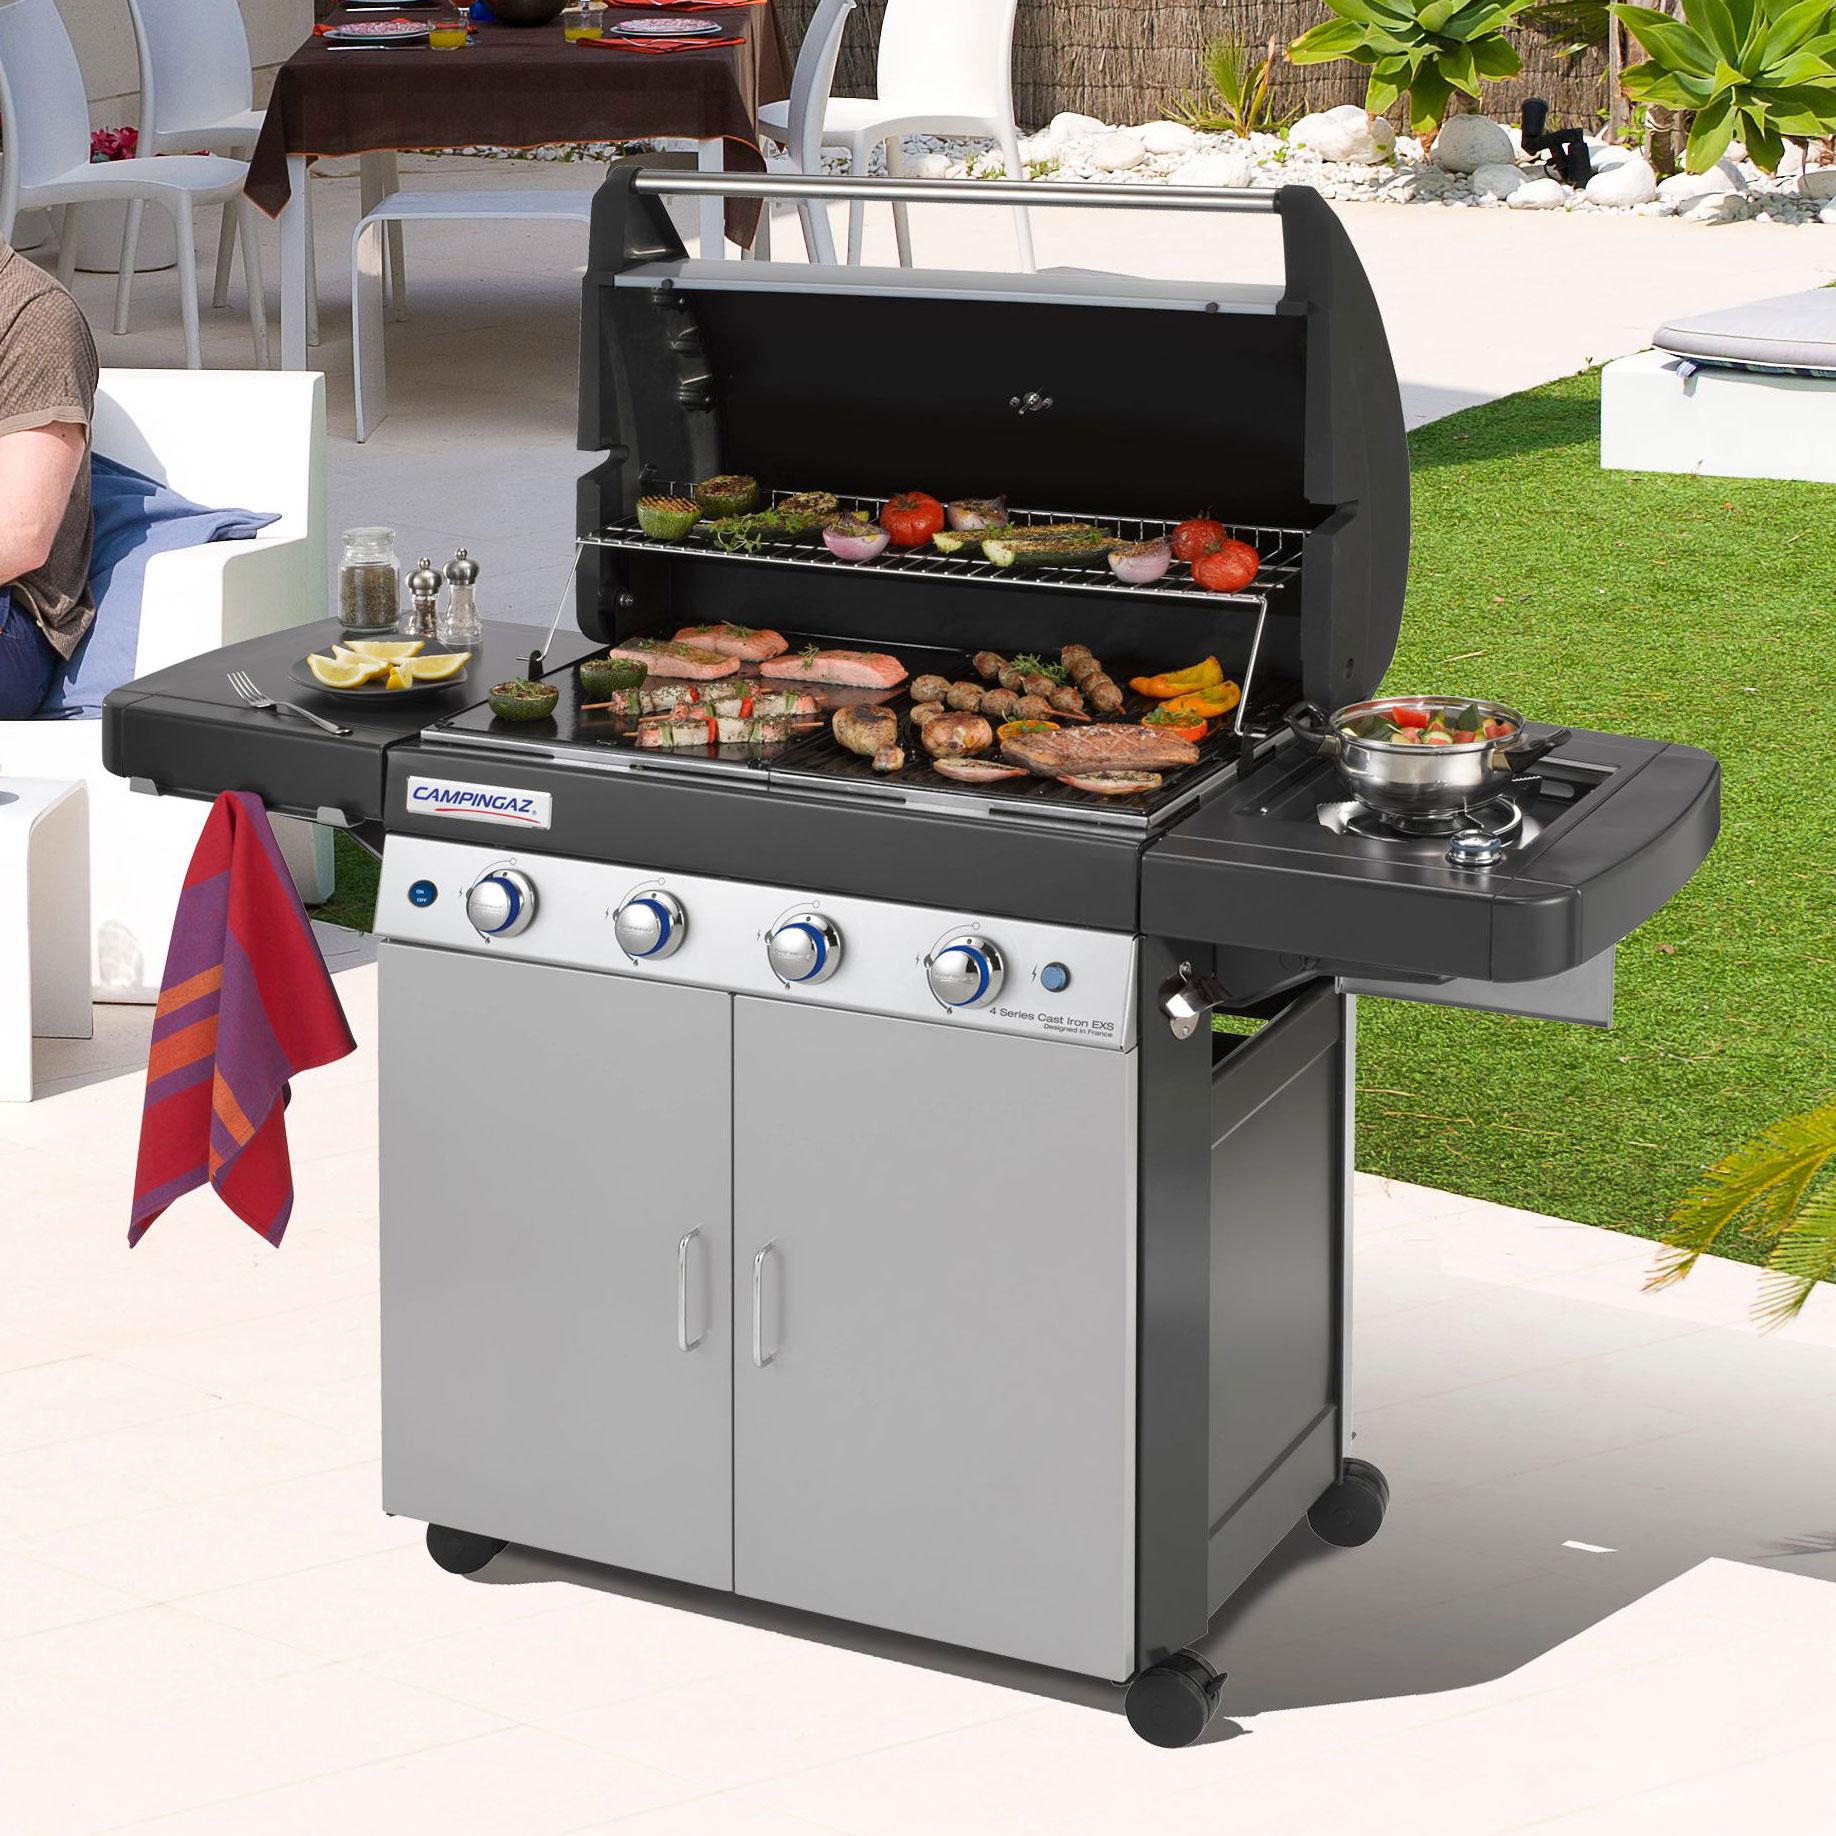 Barbecue Campingaz 4 Series Classic Lxs